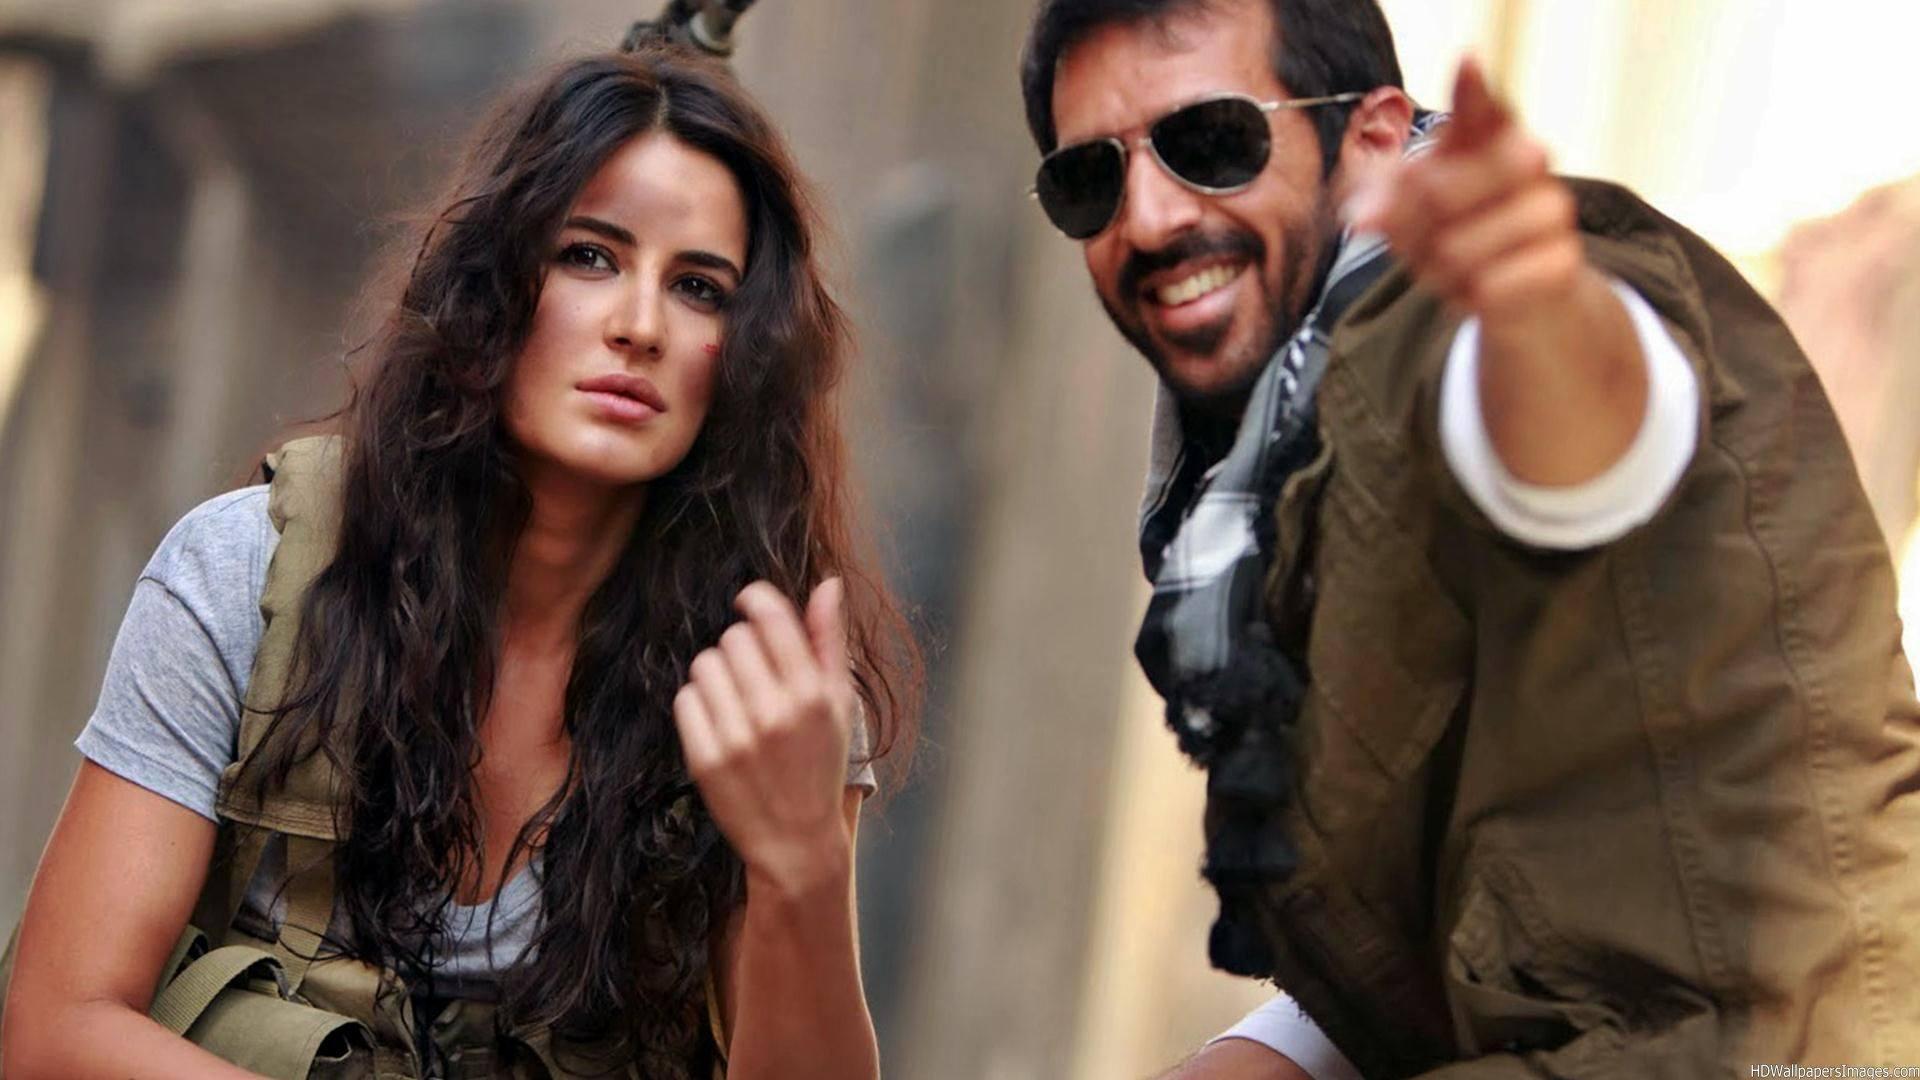 فيلم phantom للنجم Saif Ali Khan و النجمة katrina kaif